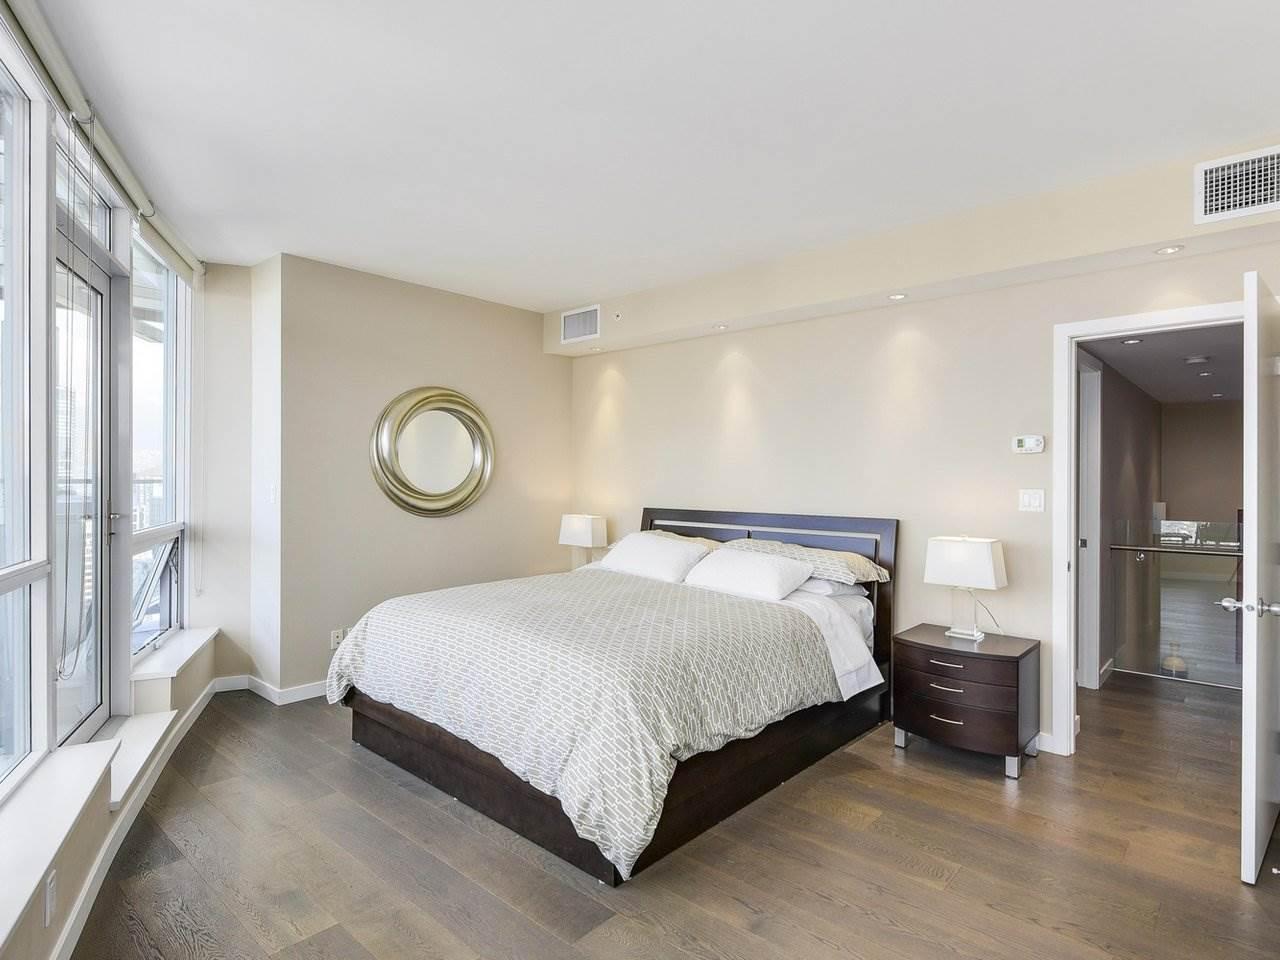 Condo Apartment at PH3 833 SEYMOUR STREET, Unit PH3, Vancouver West, British Columbia. Image 13